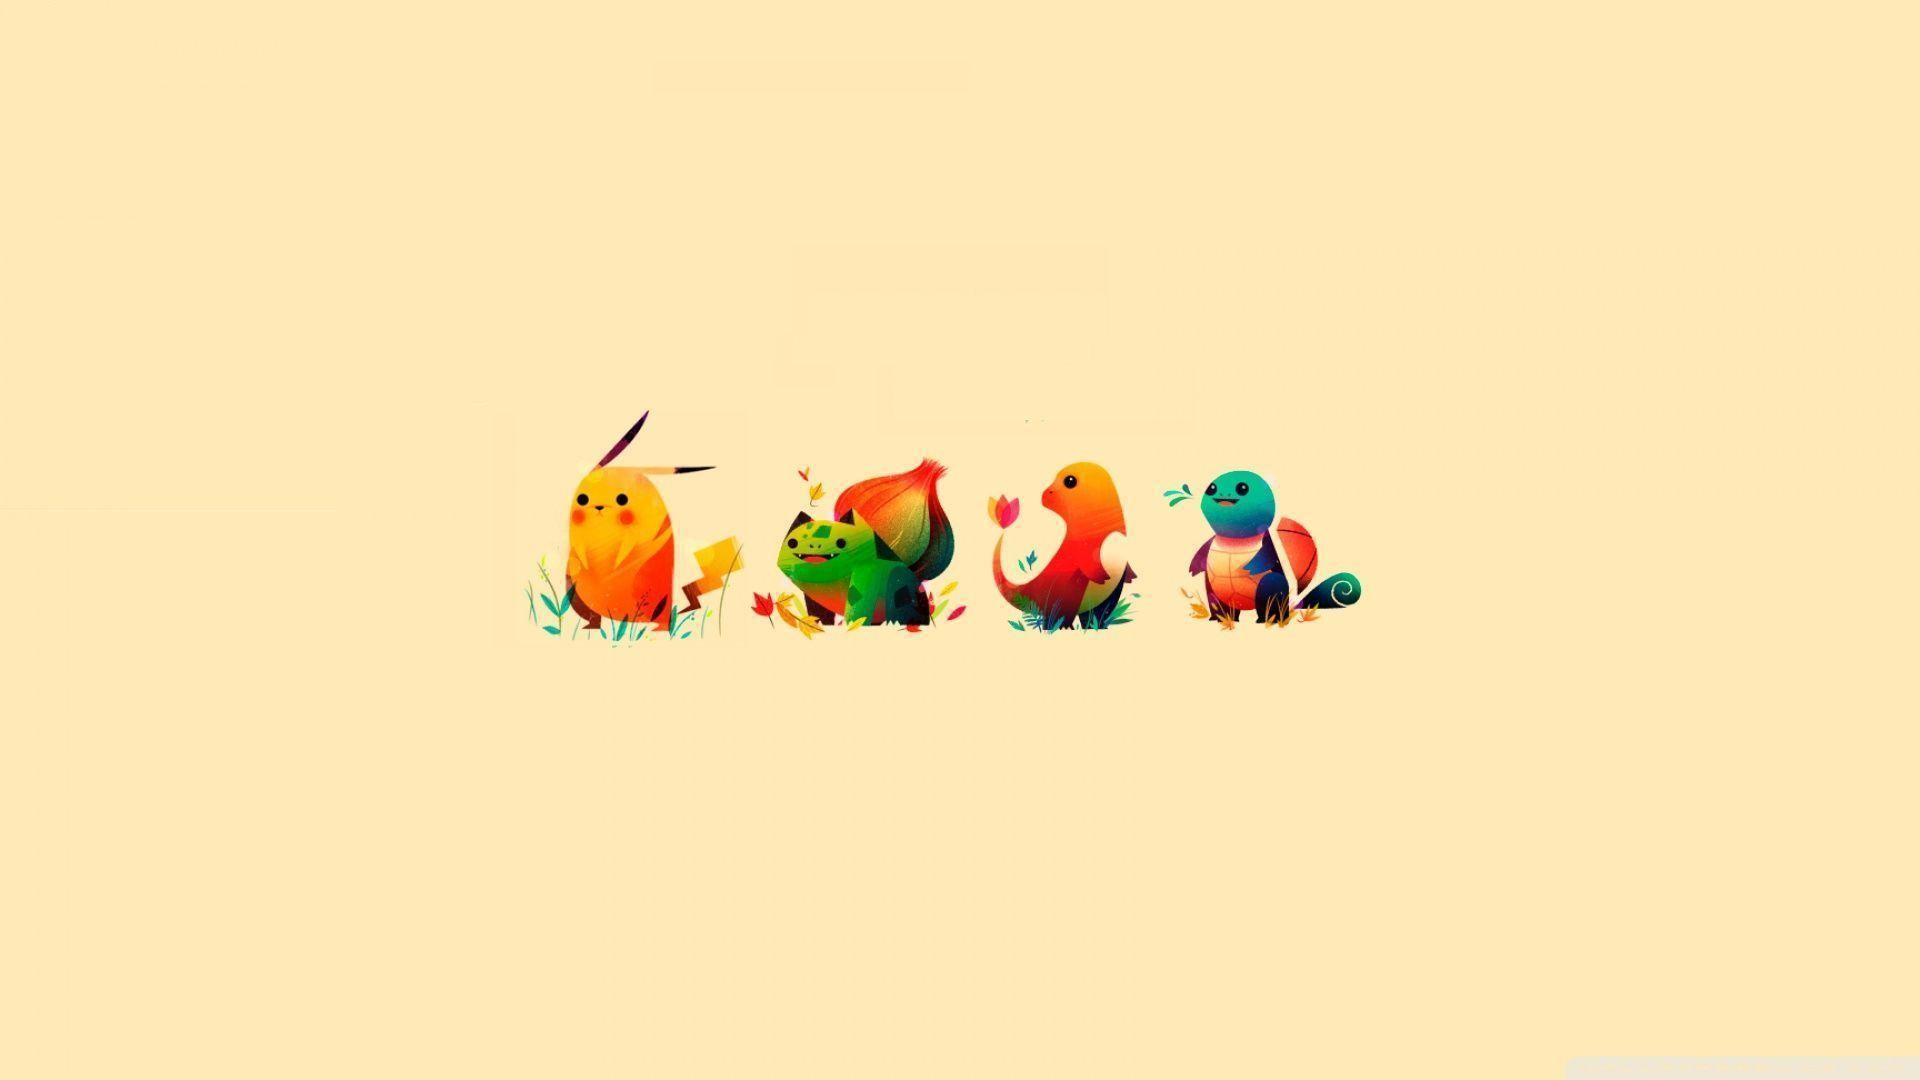 Download Pokemon Bulbasaur Pikachu Charmander Squirtle Wallpaper .